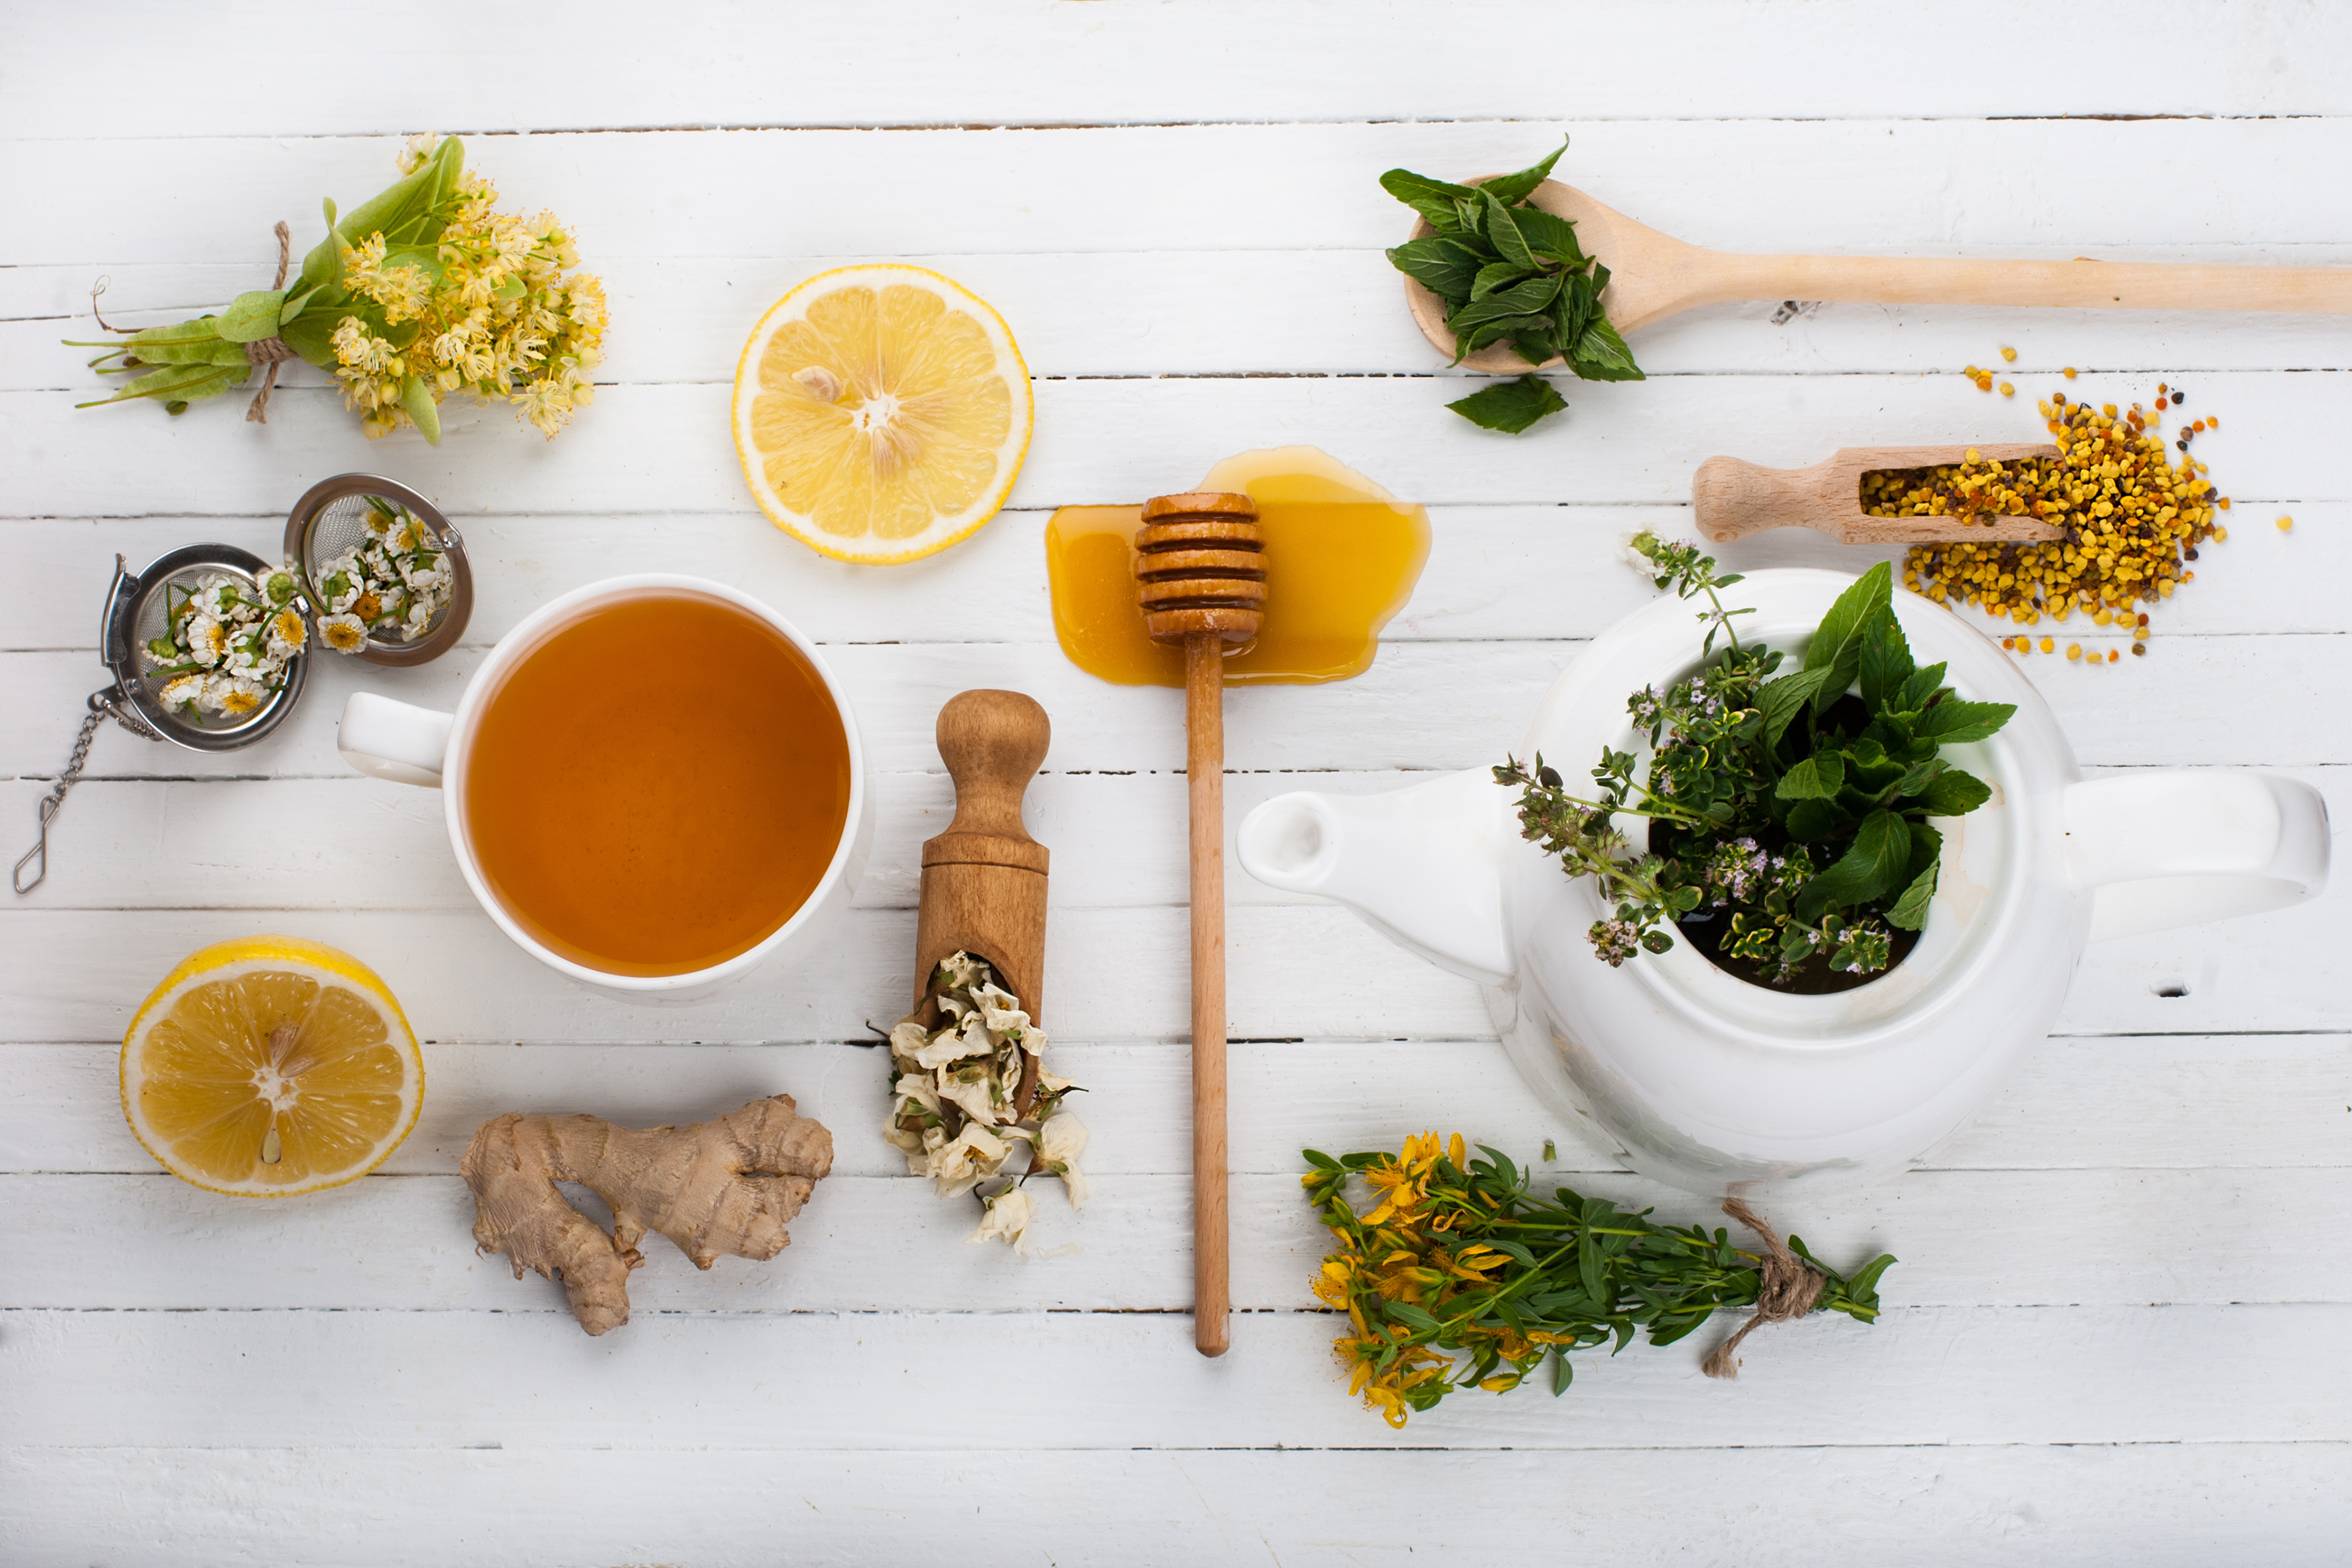 Set for herbal tea. Detox background.